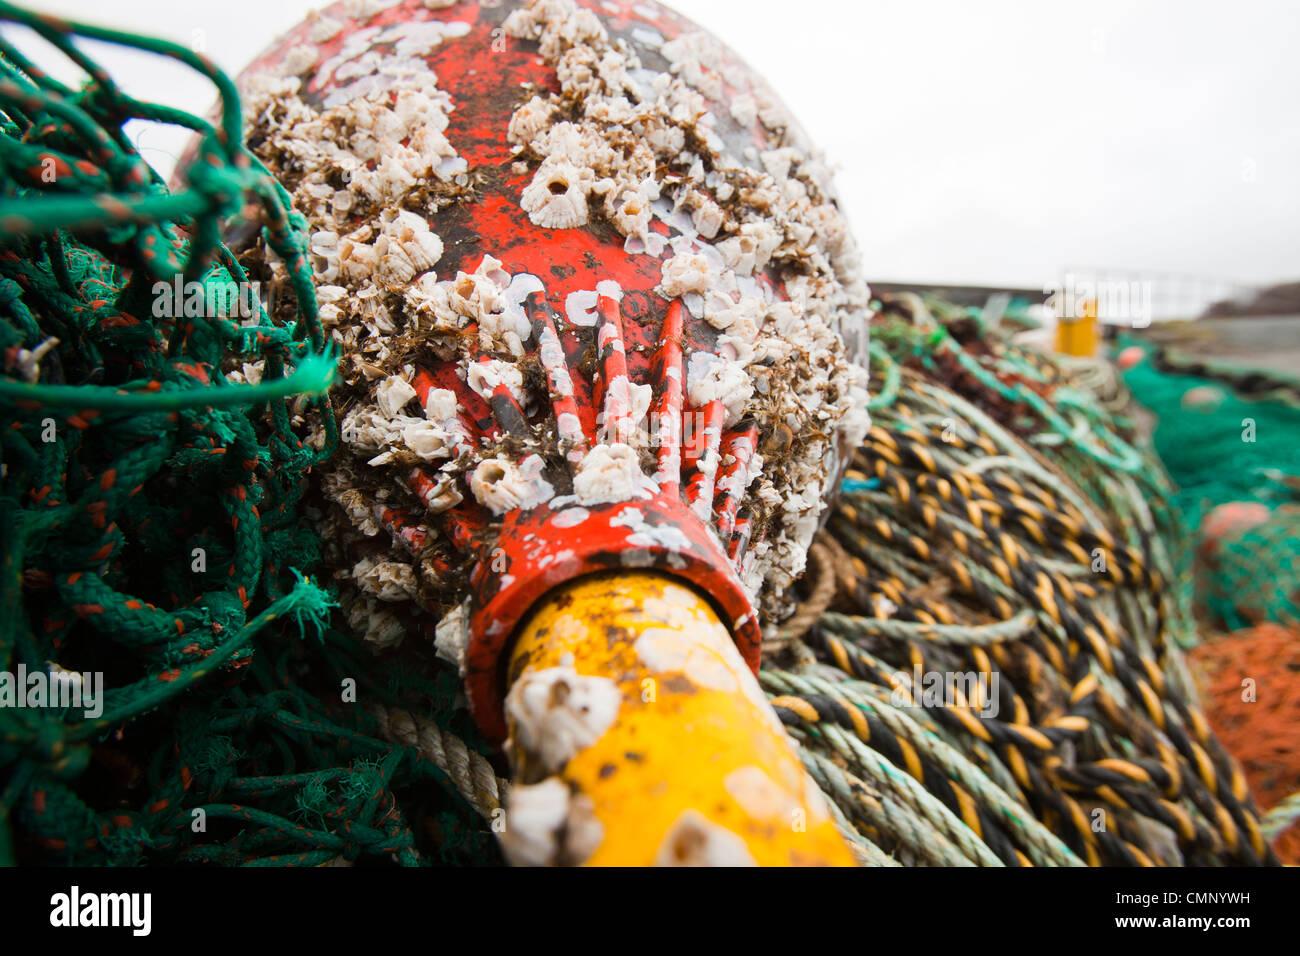 Fanggeräte am Hafen an der Portnalong, Isle Of Skye, Schottland, Großbritannien. Stockfoto